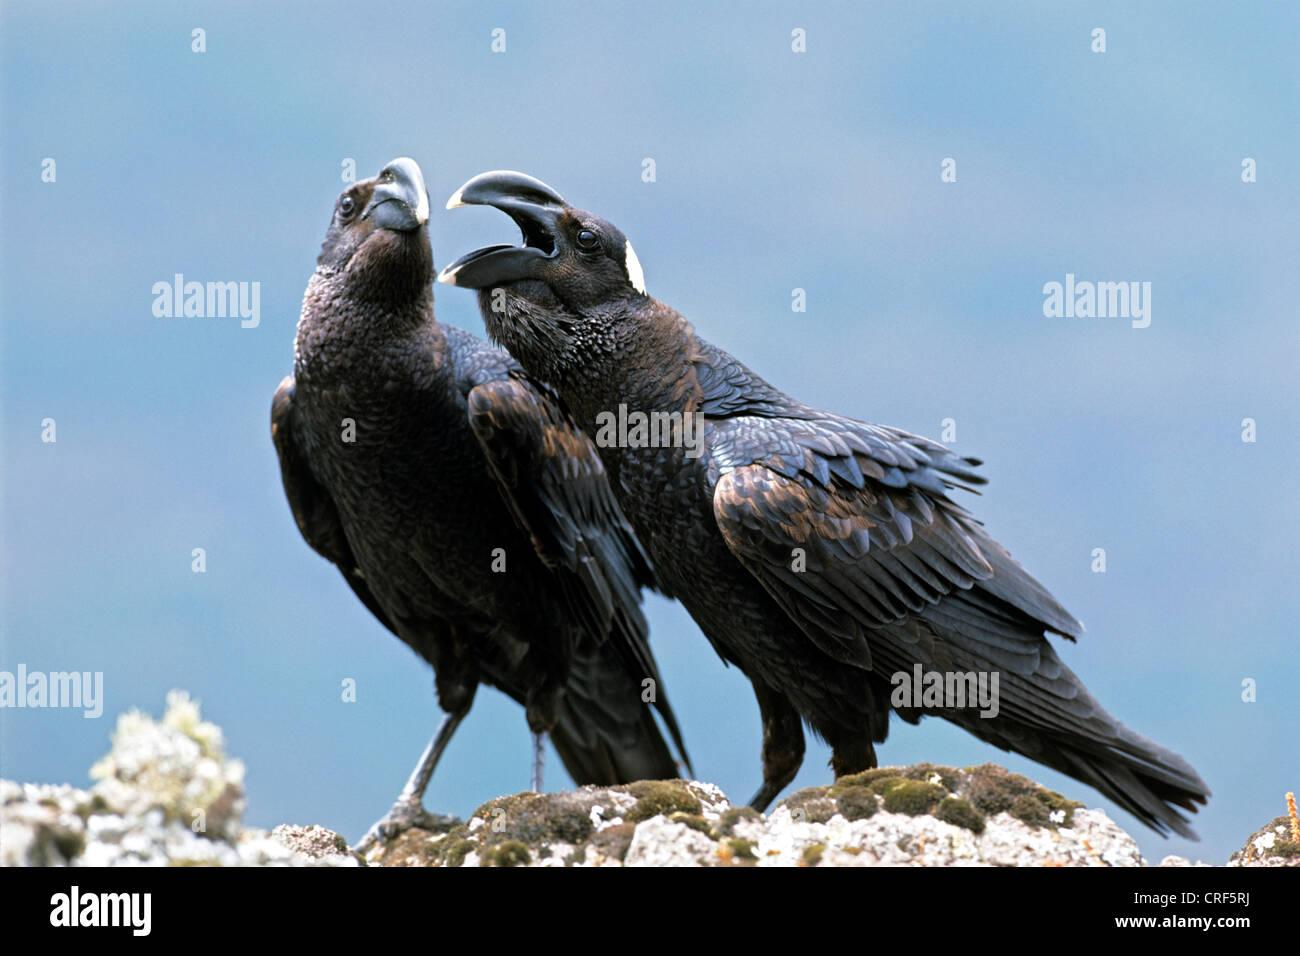 thick-billed raven (Corvus crassirostris), quarreling couple, Ethiopia, Simien Mountains National Park - Stock Image